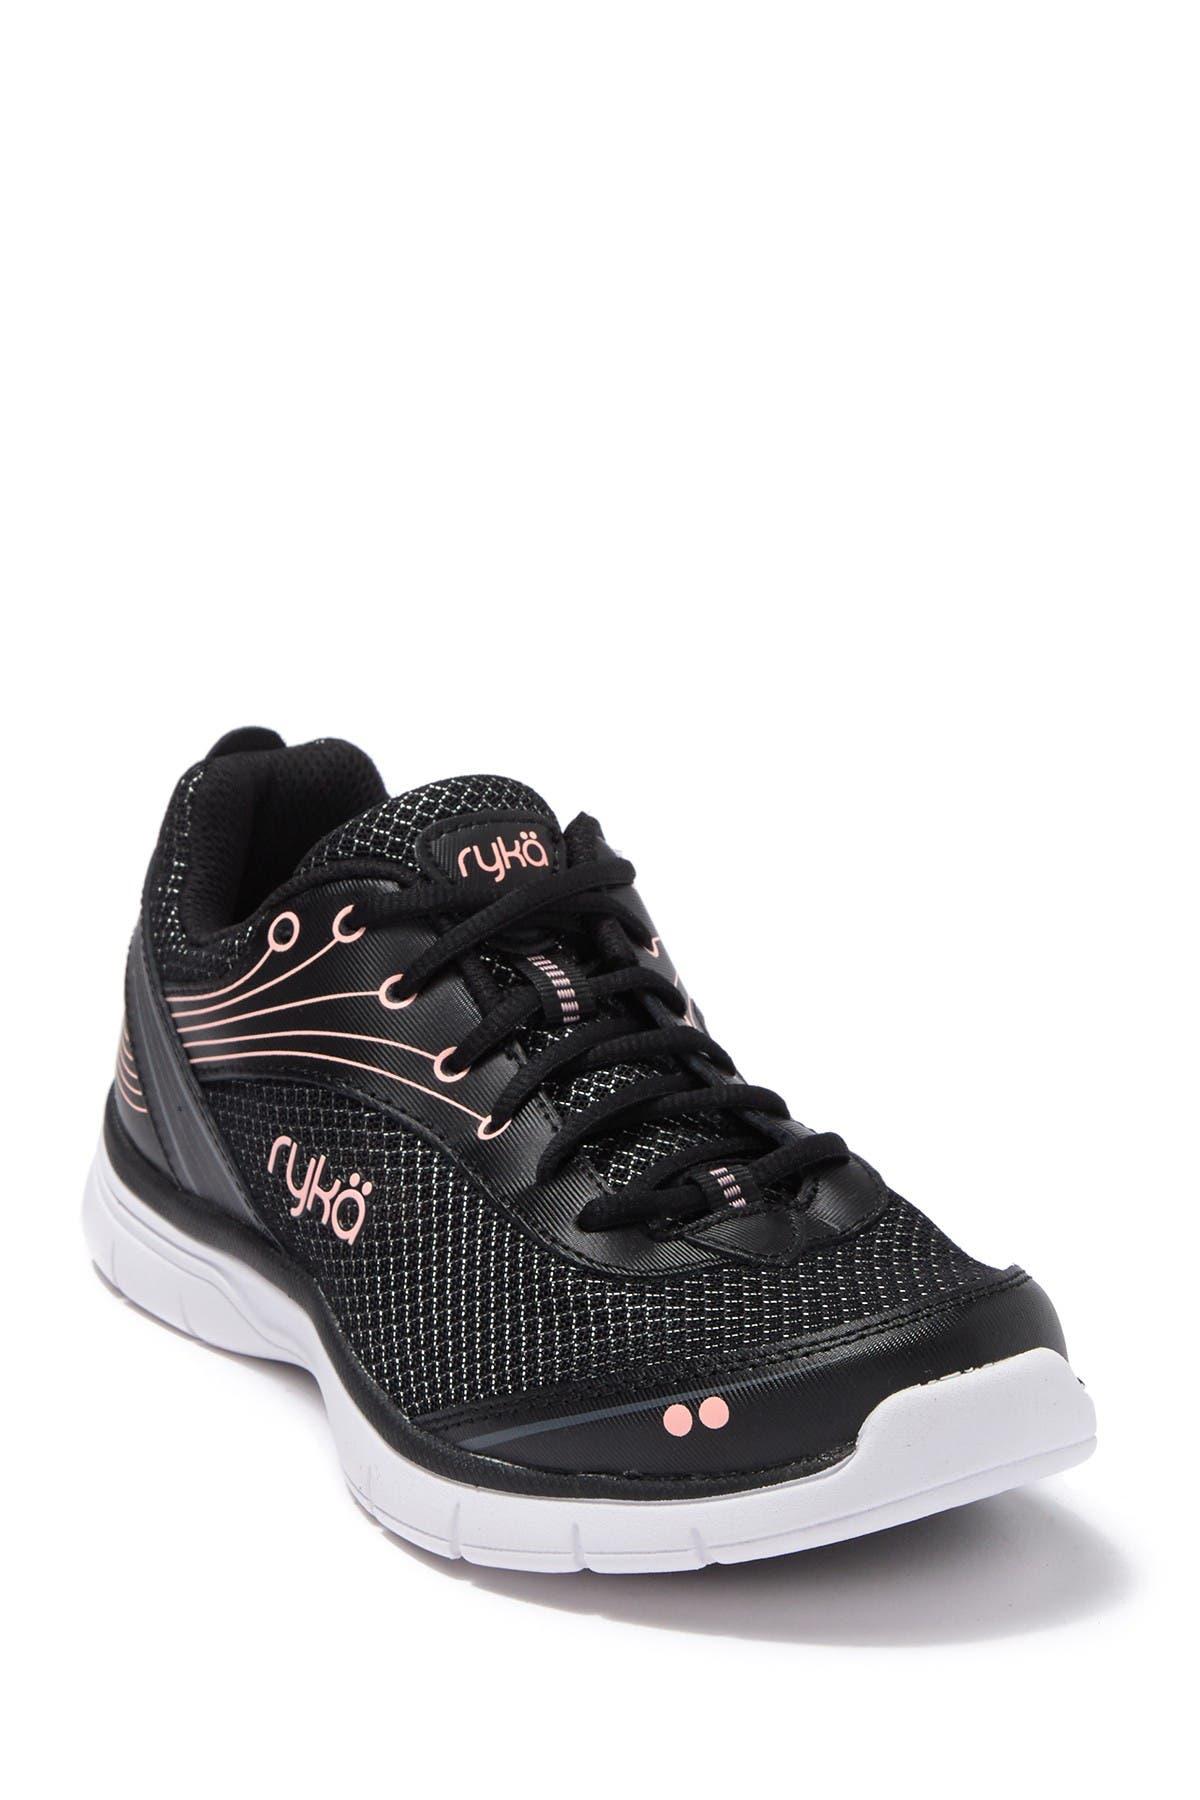 Ryka | Destiny Cross Trainer Sneaker